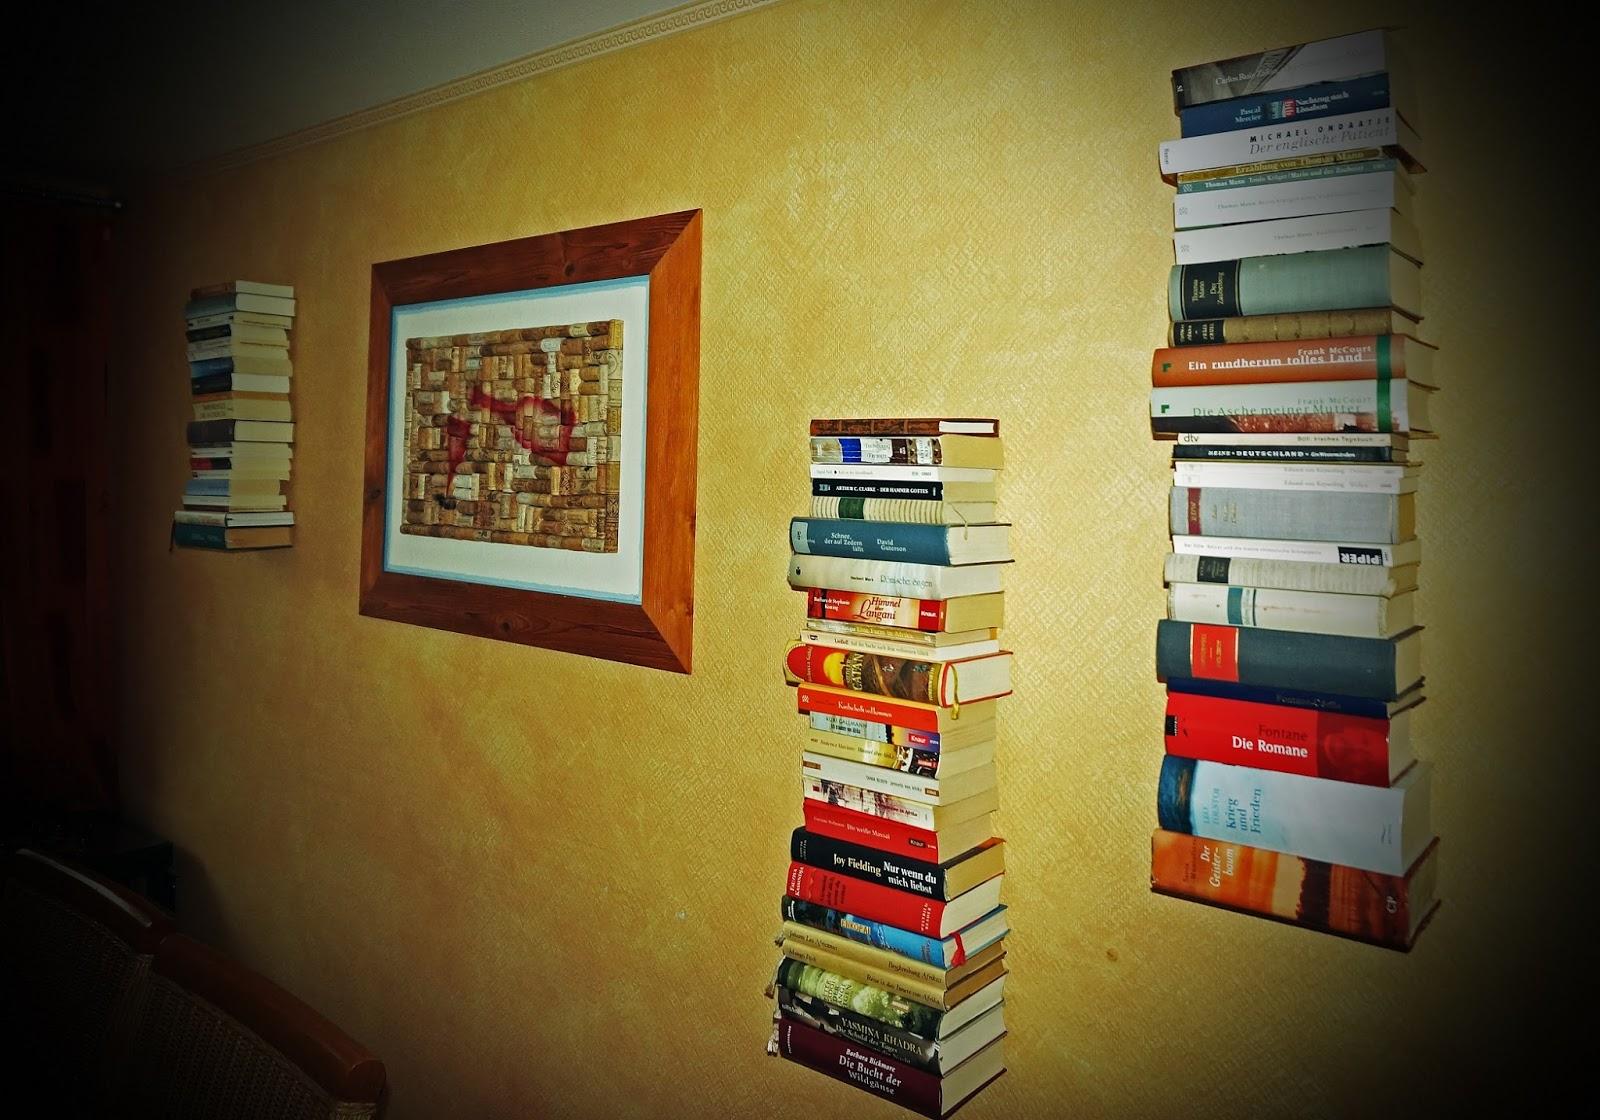 f r leseratten und b cherw rmer blog von claudia paal. Black Bedroom Furniture Sets. Home Design Ideas